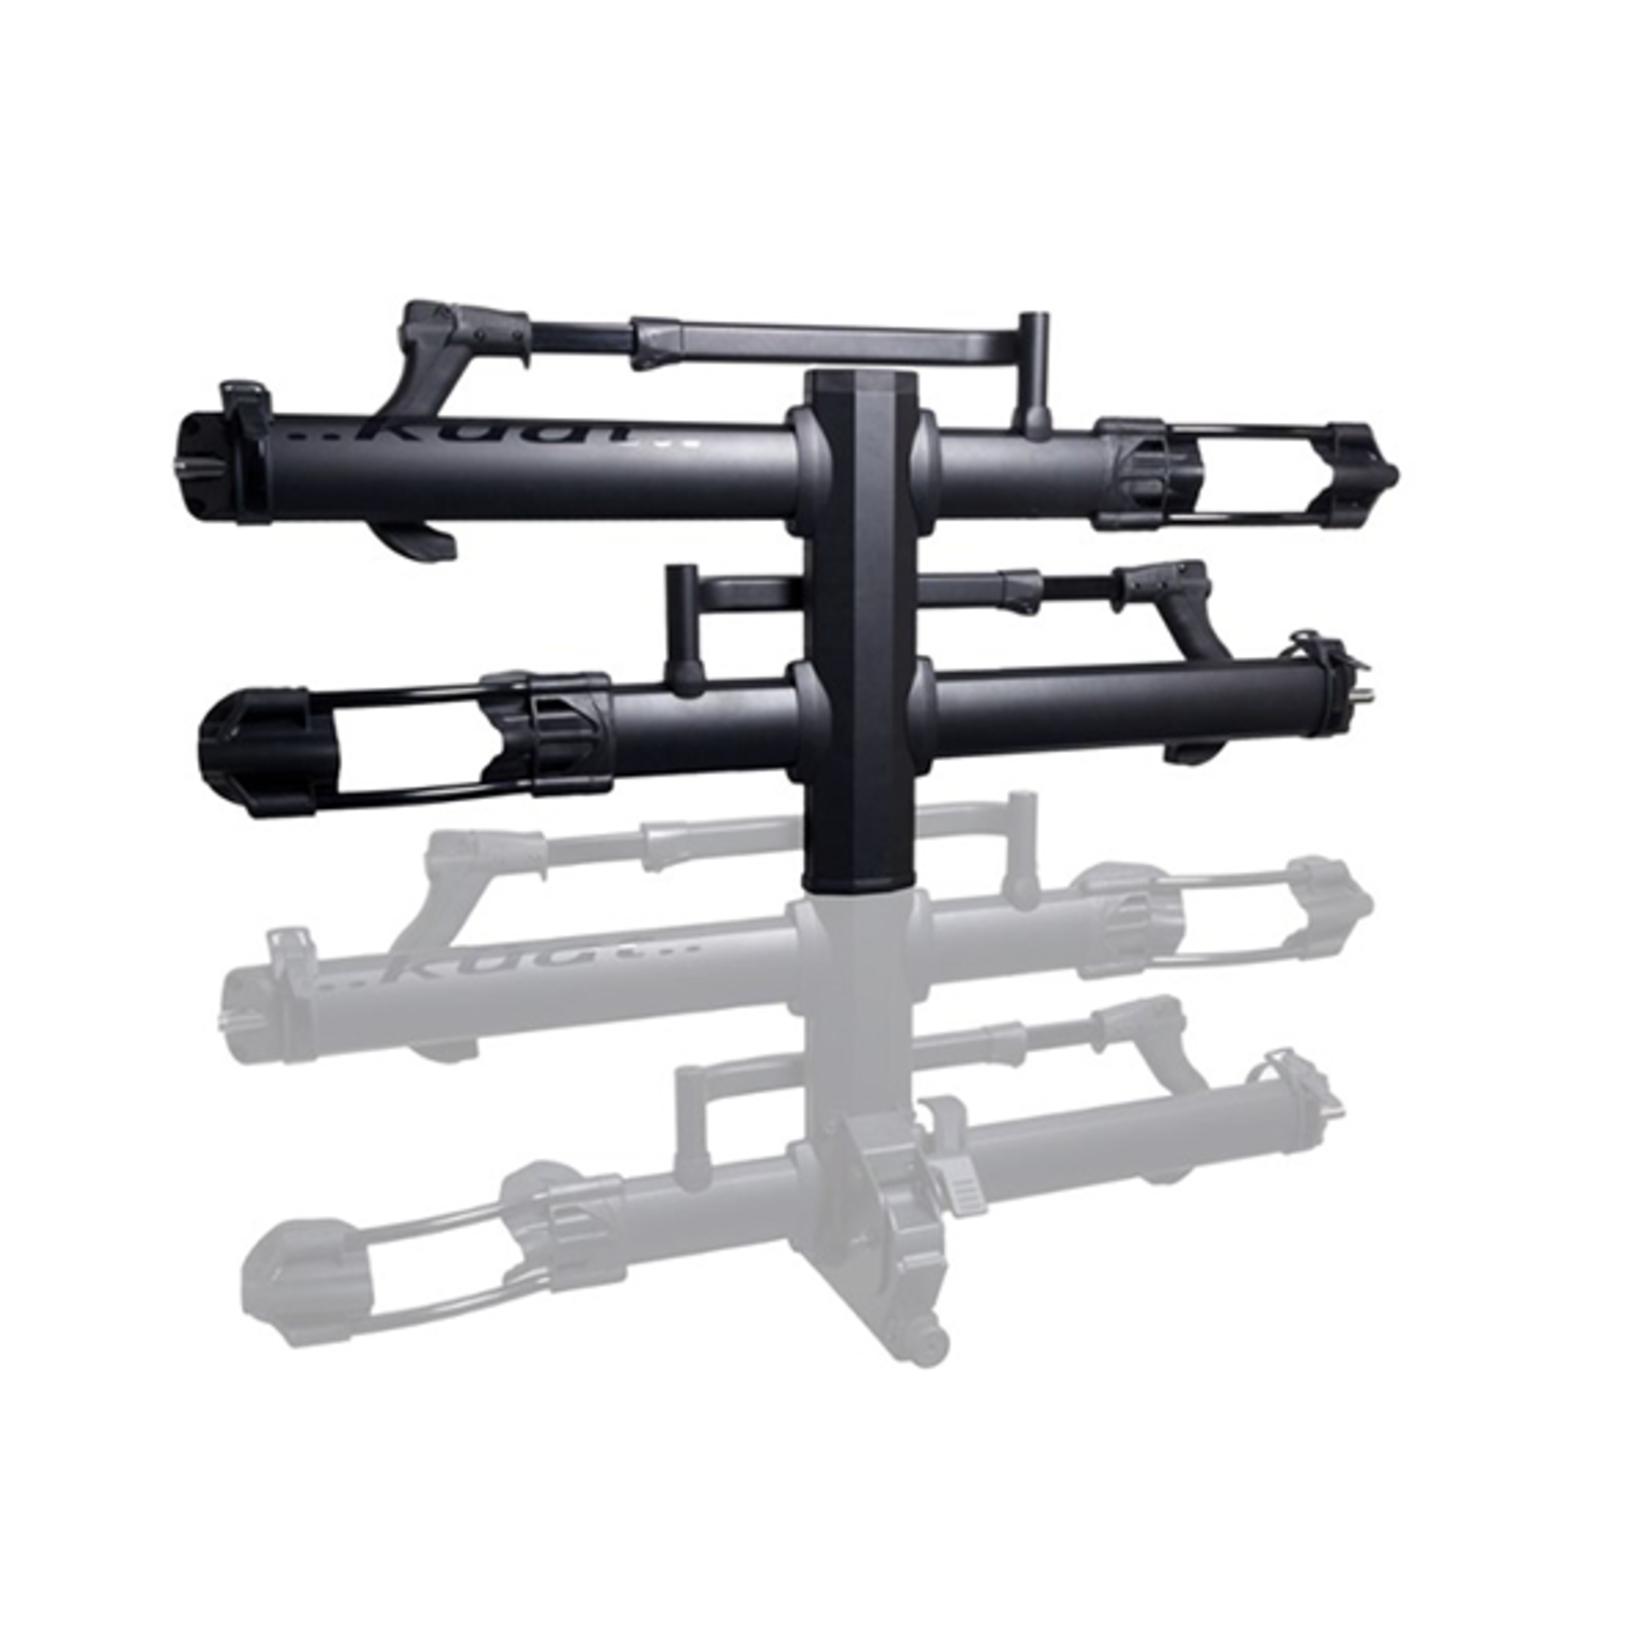 "Kuat Racks NV Base Add-On 2"" - 2 Bike Rack"